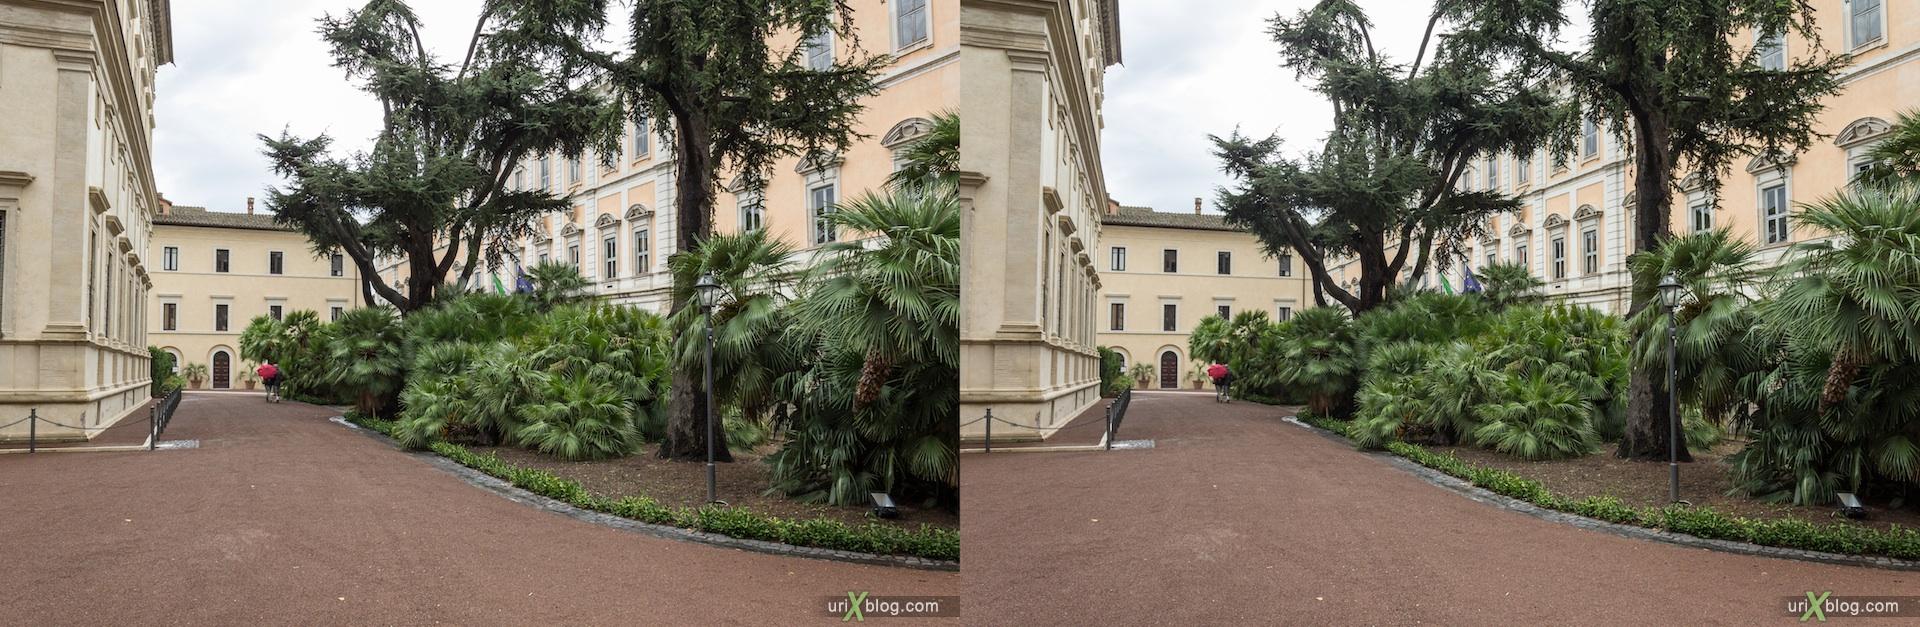 2012, Villa Farnesina, Rome, Italy, Europe, 3D, stereo pair, cross-eyed, crossview, cross view stereo pair